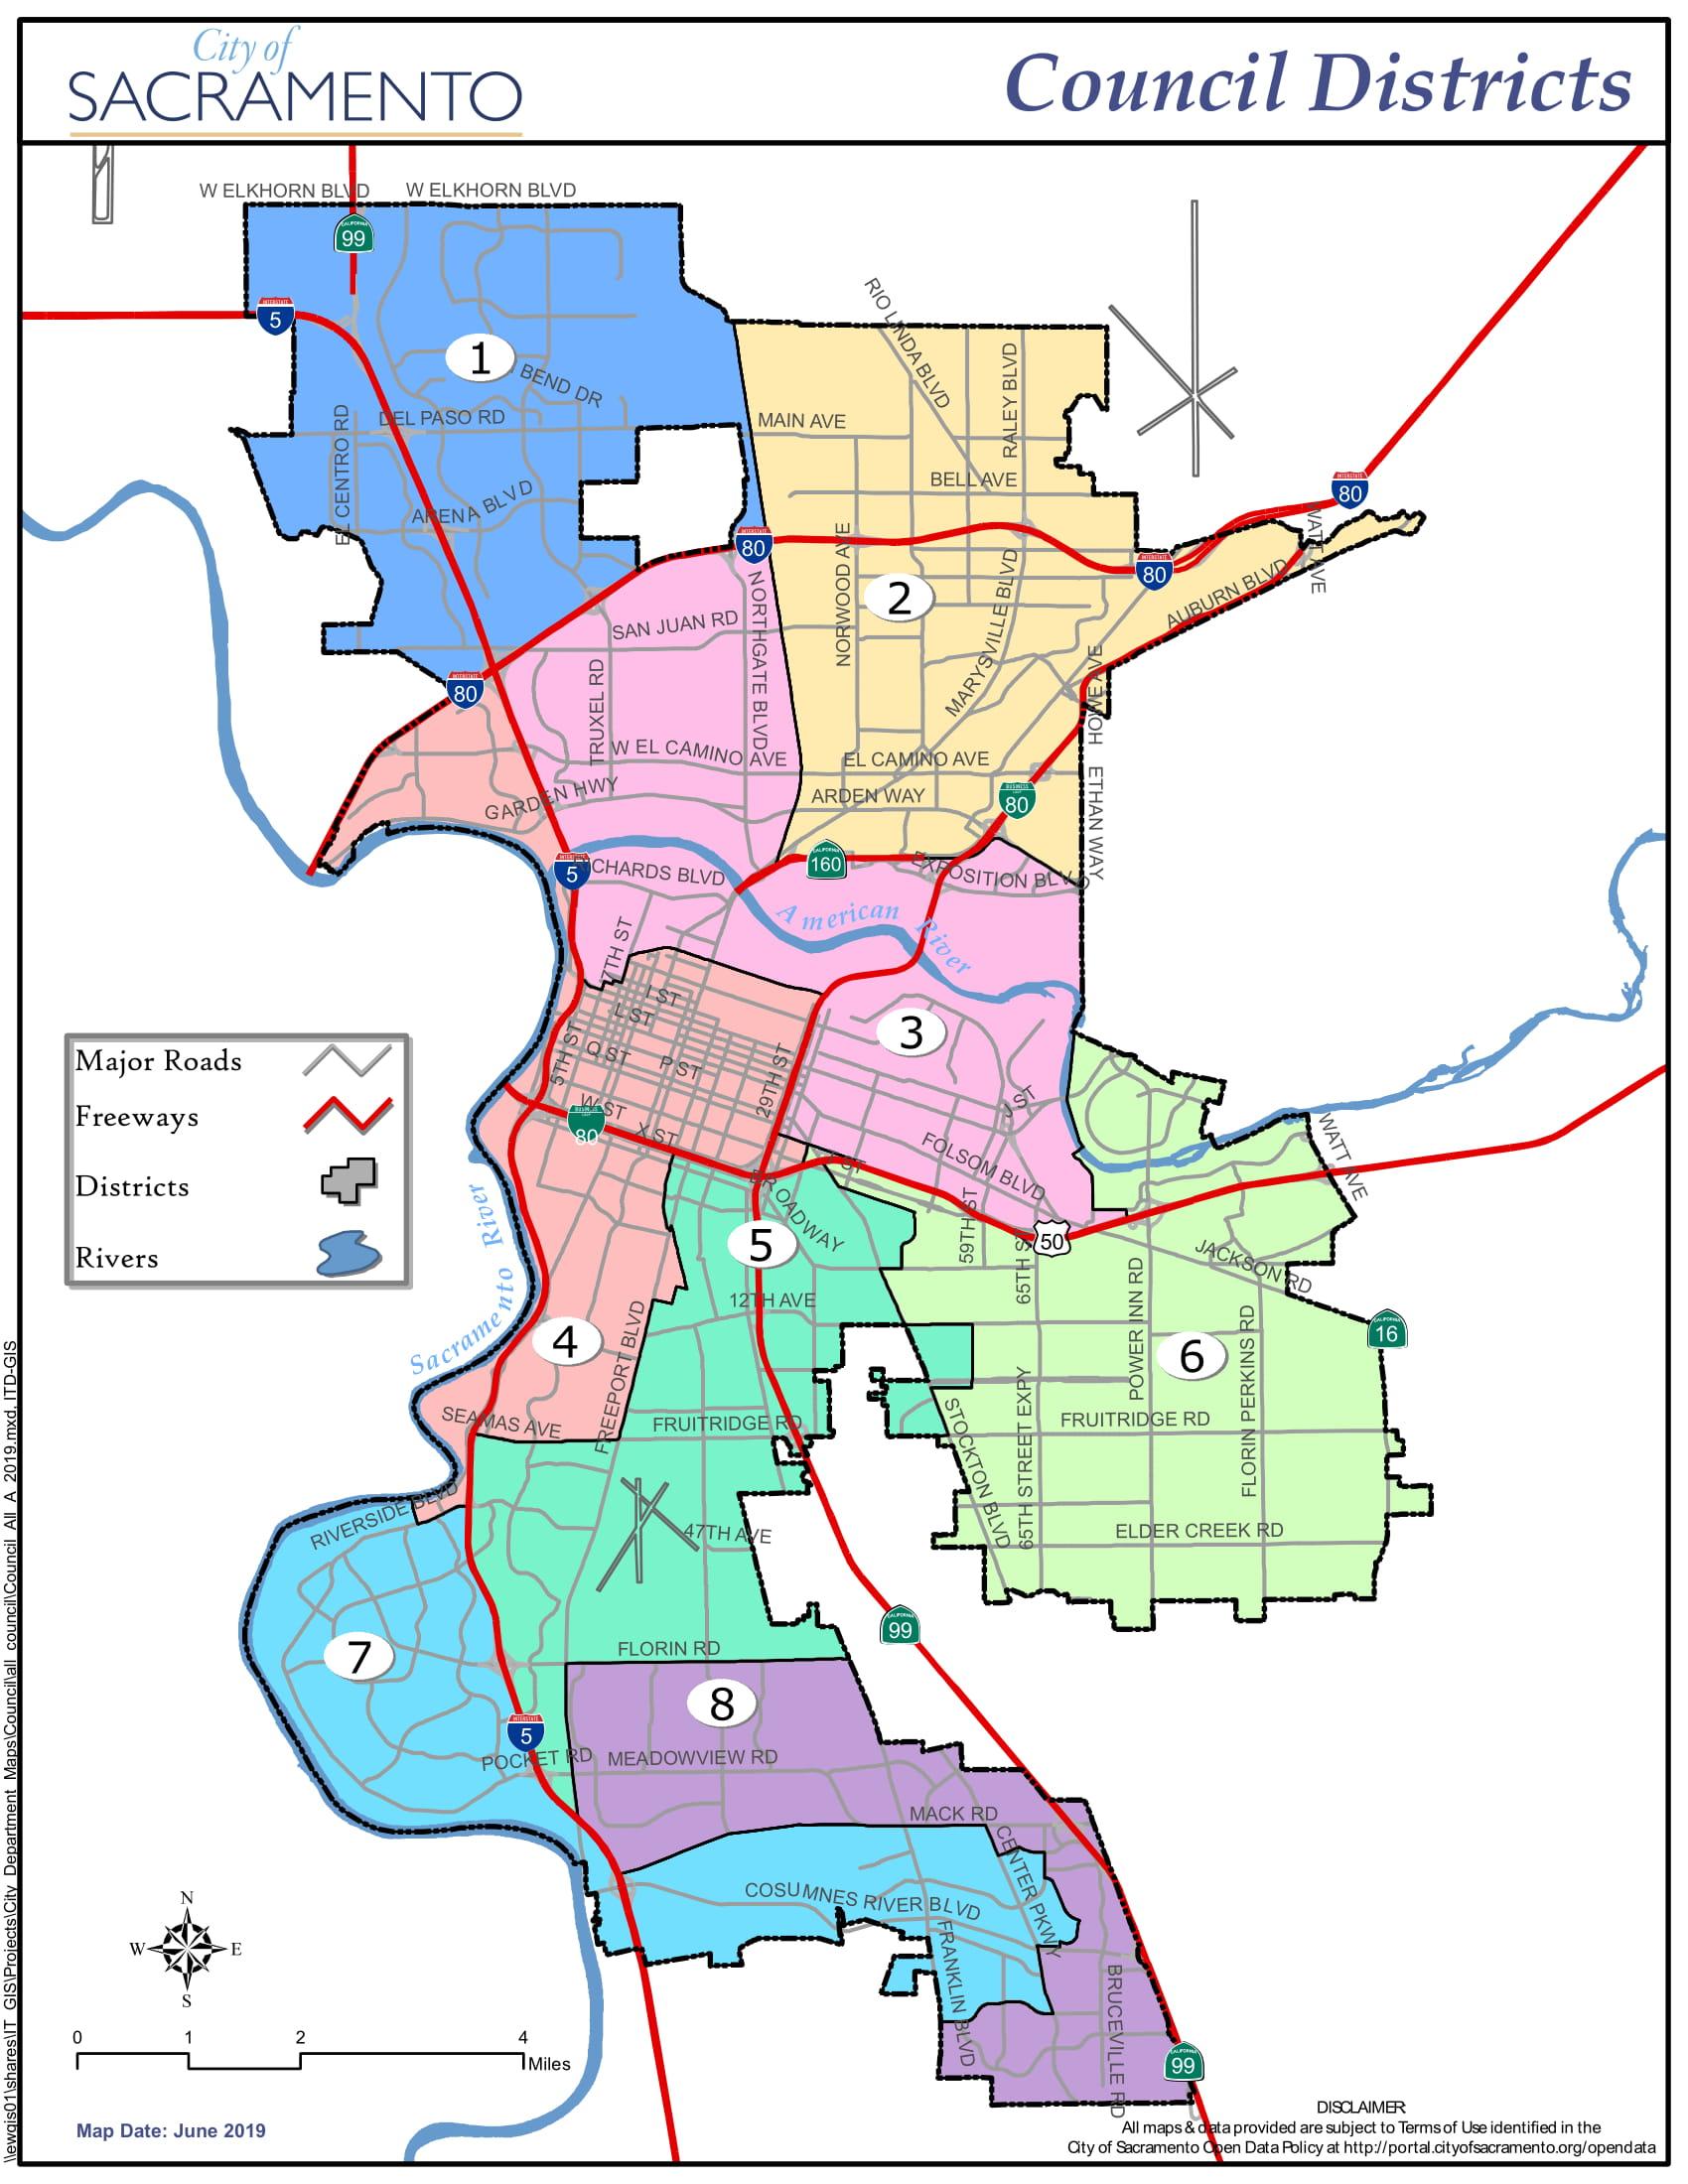 Map of City Limits - City of Sacramento